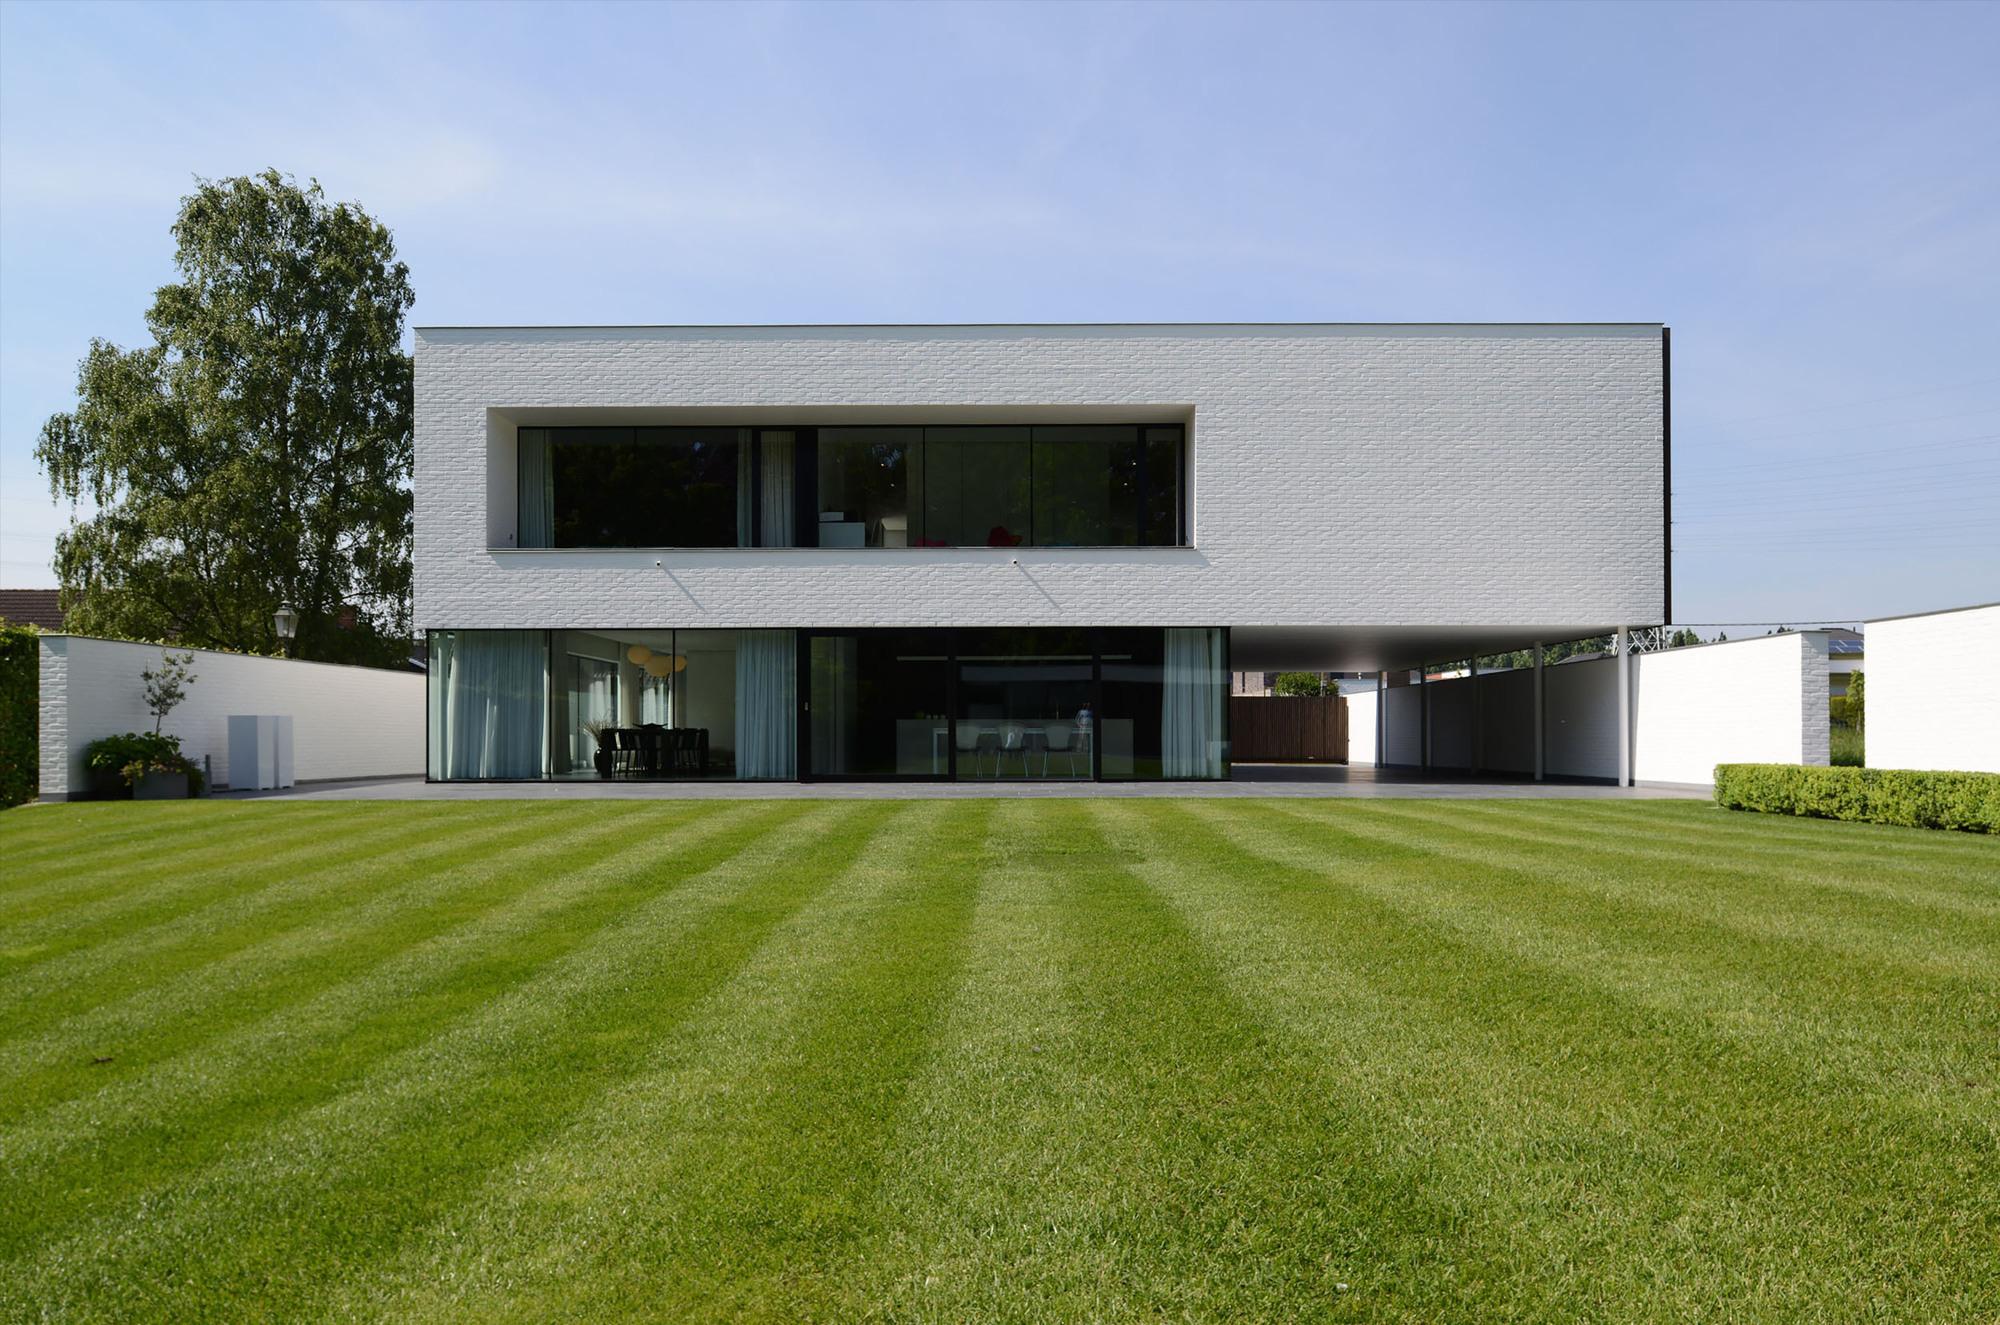 Impressionnante maison contemporaine flamande a for Architecture flamande